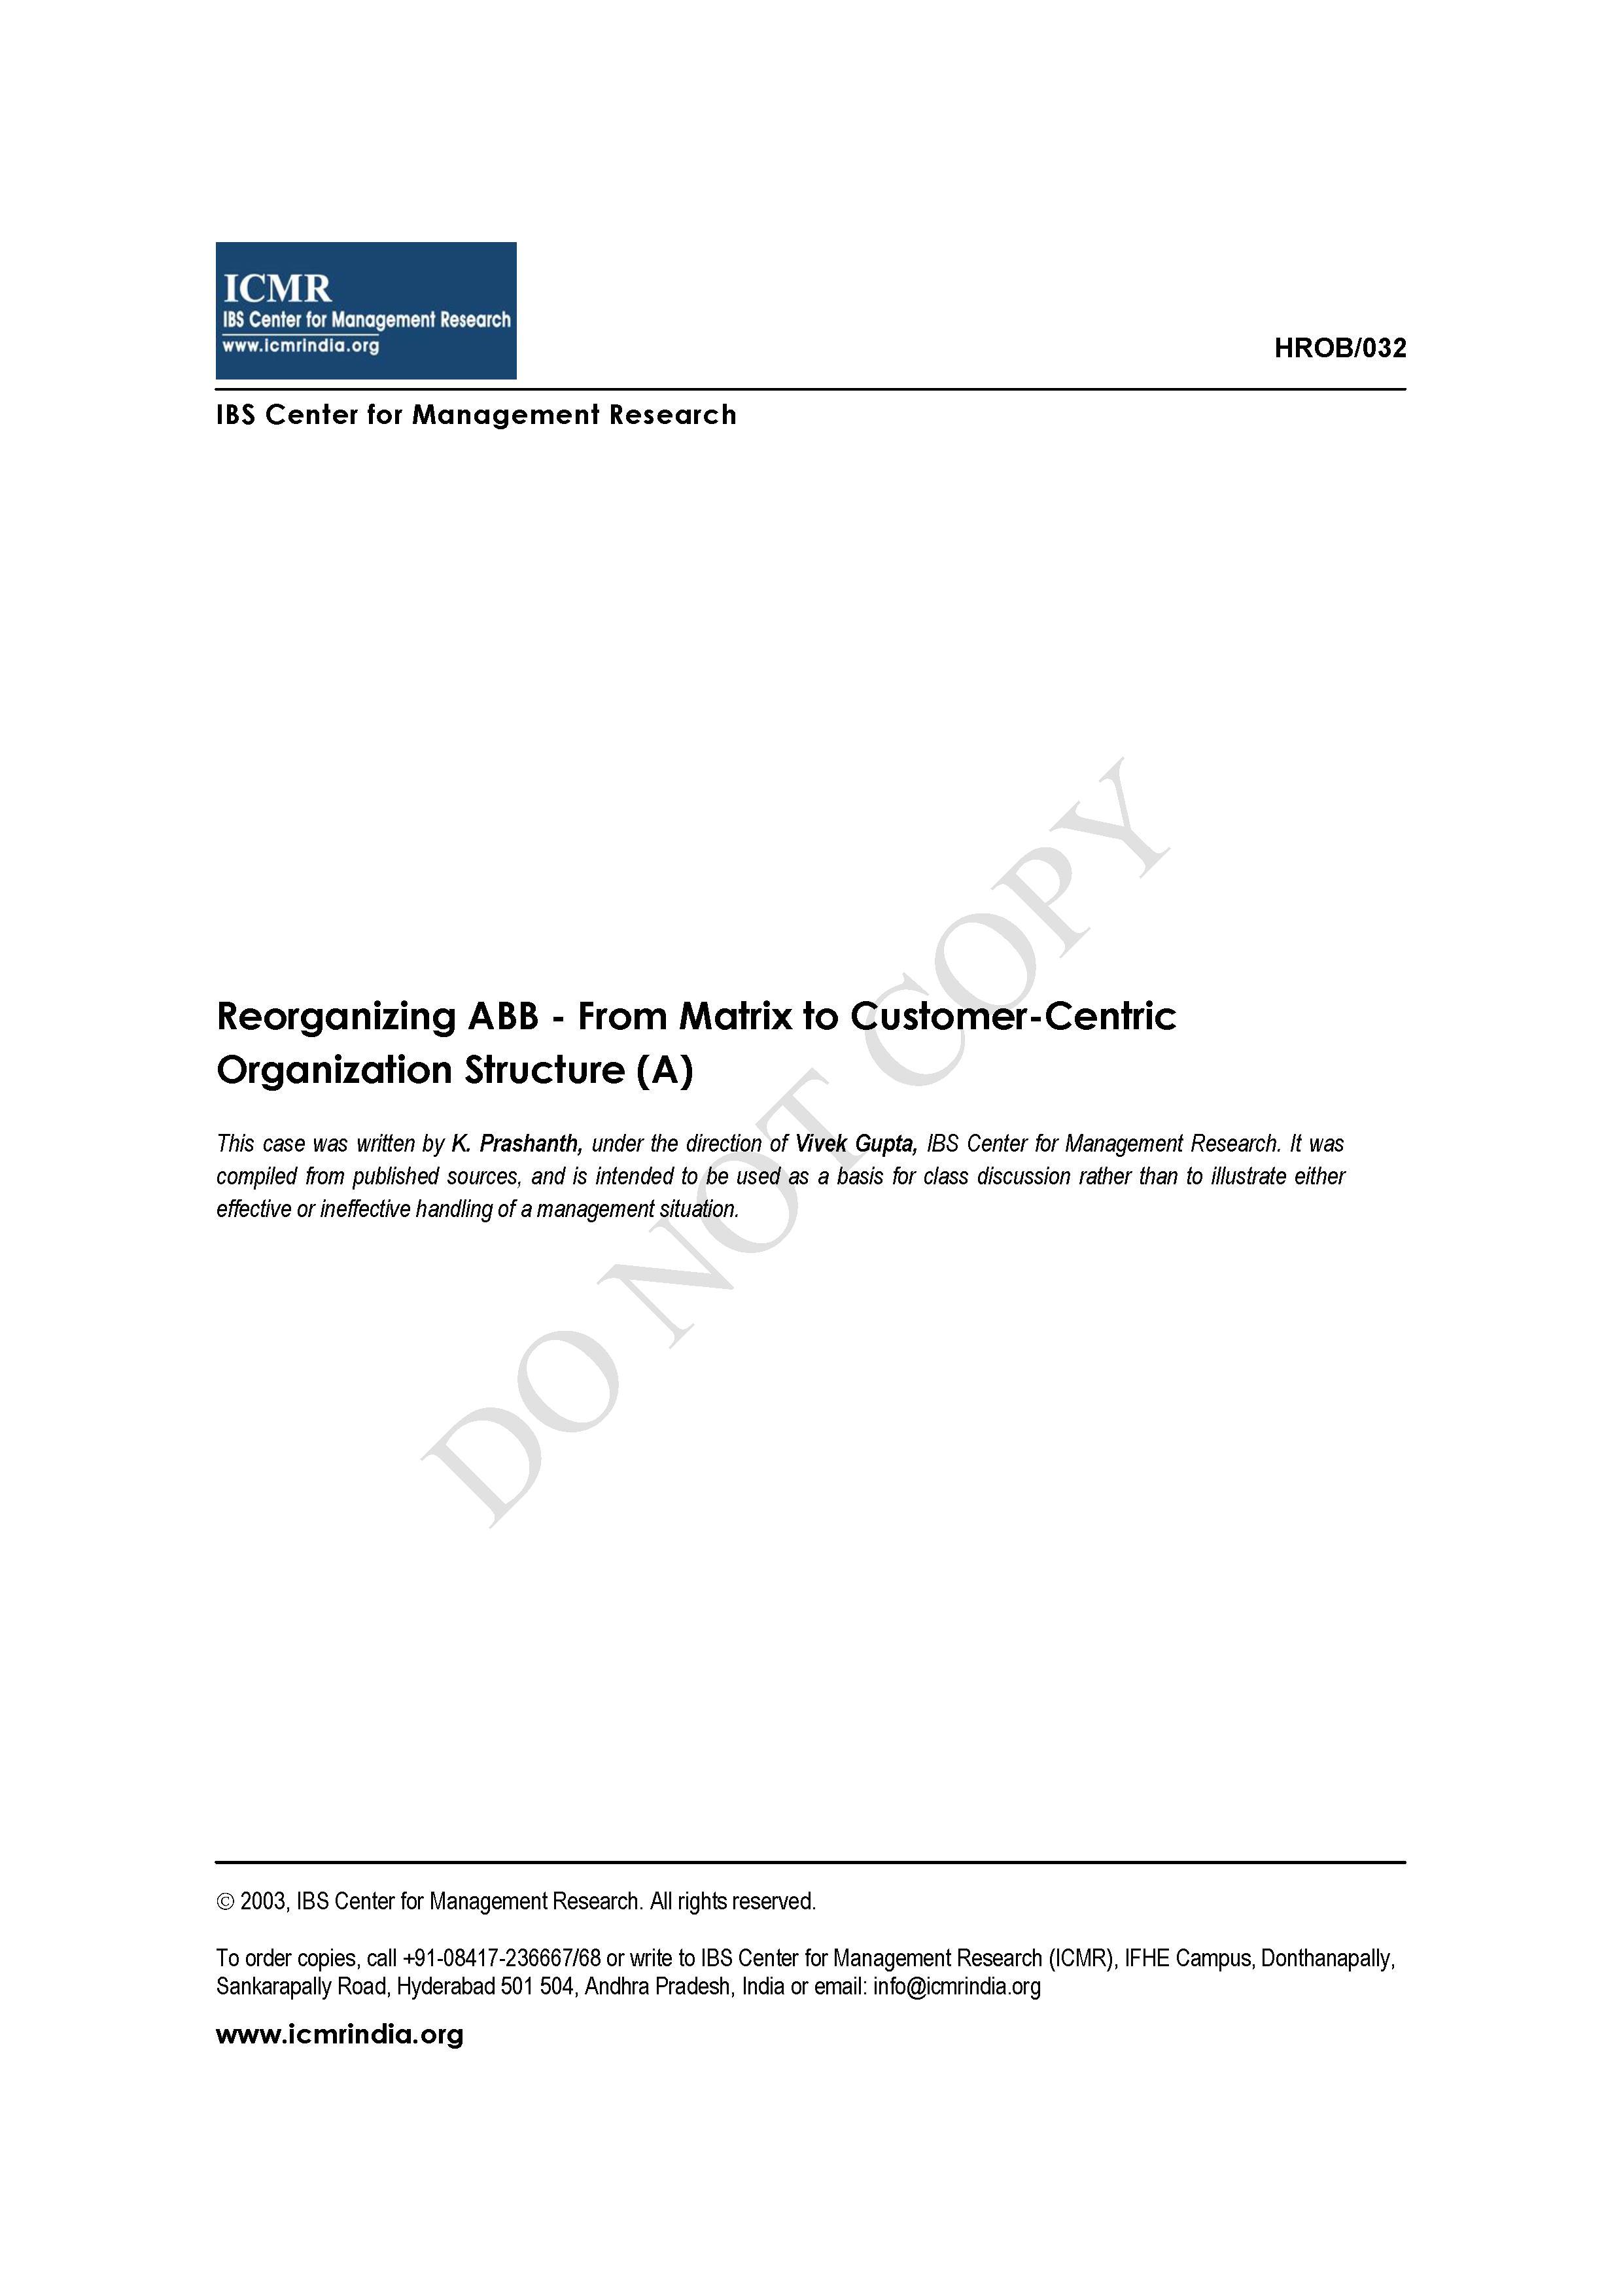 Reorganizing ABB - From Matrix to Customer-Centric